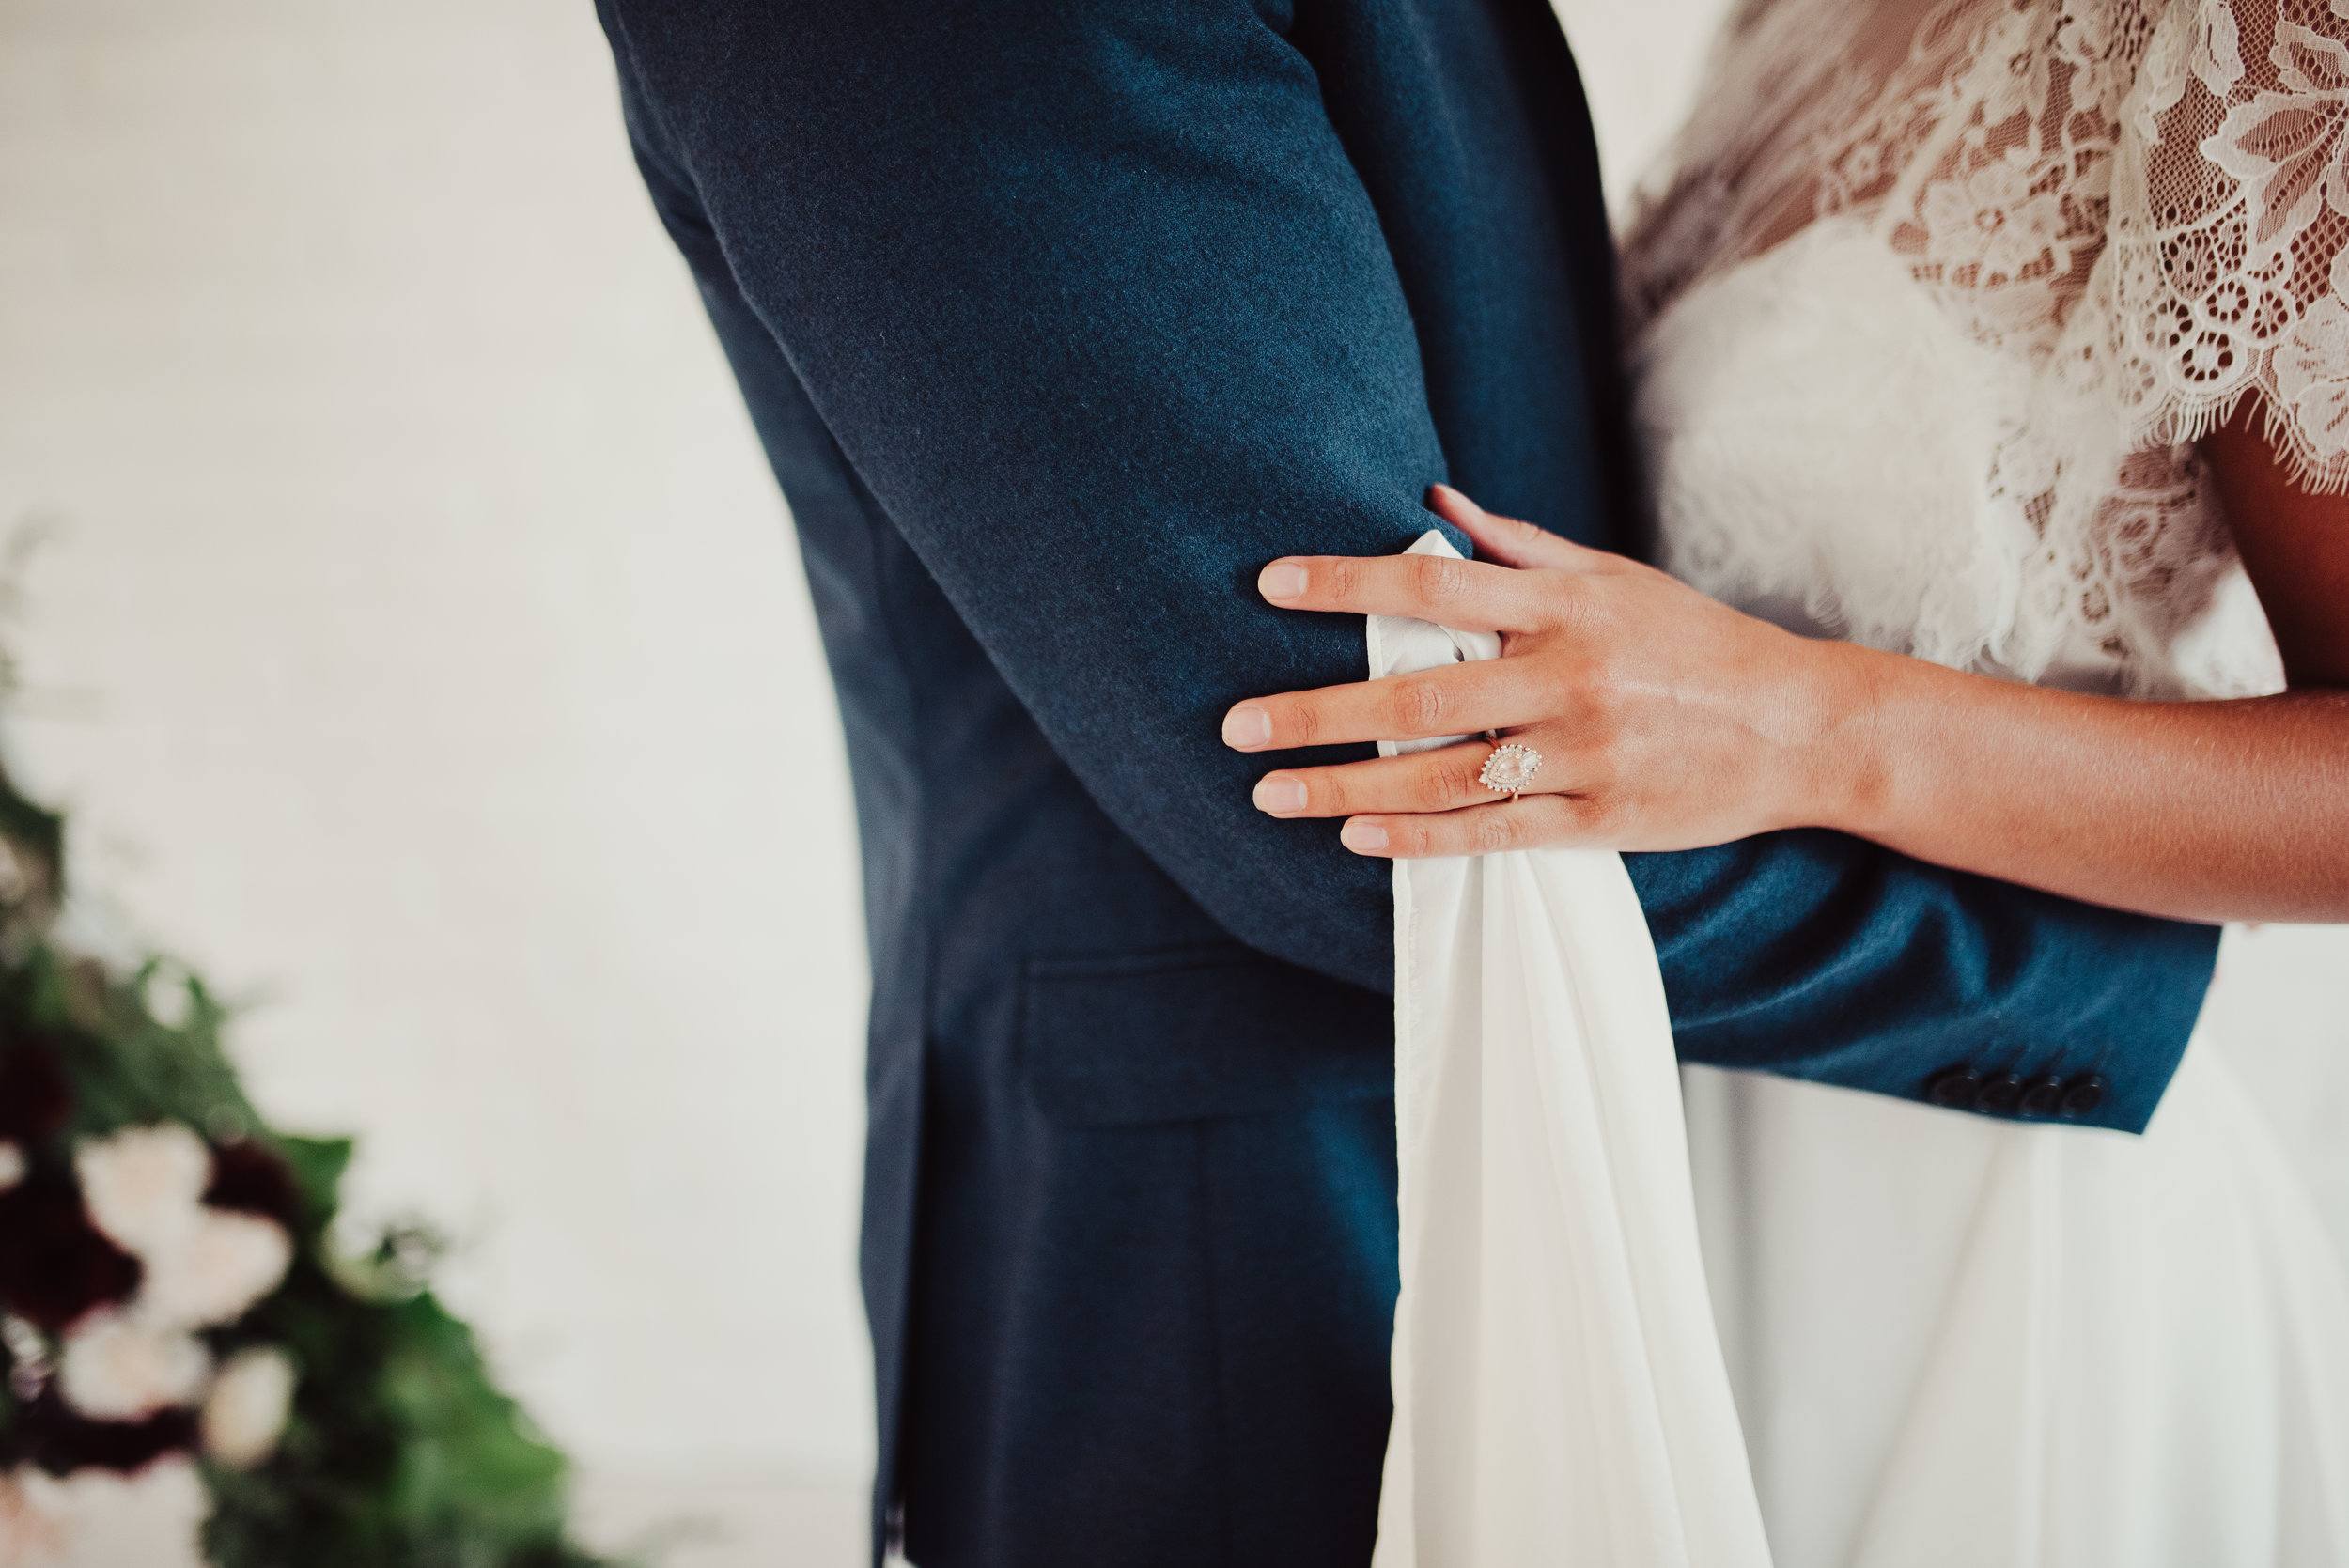 heidi-gibson-designs-gatsby-wedding-ring.jpg